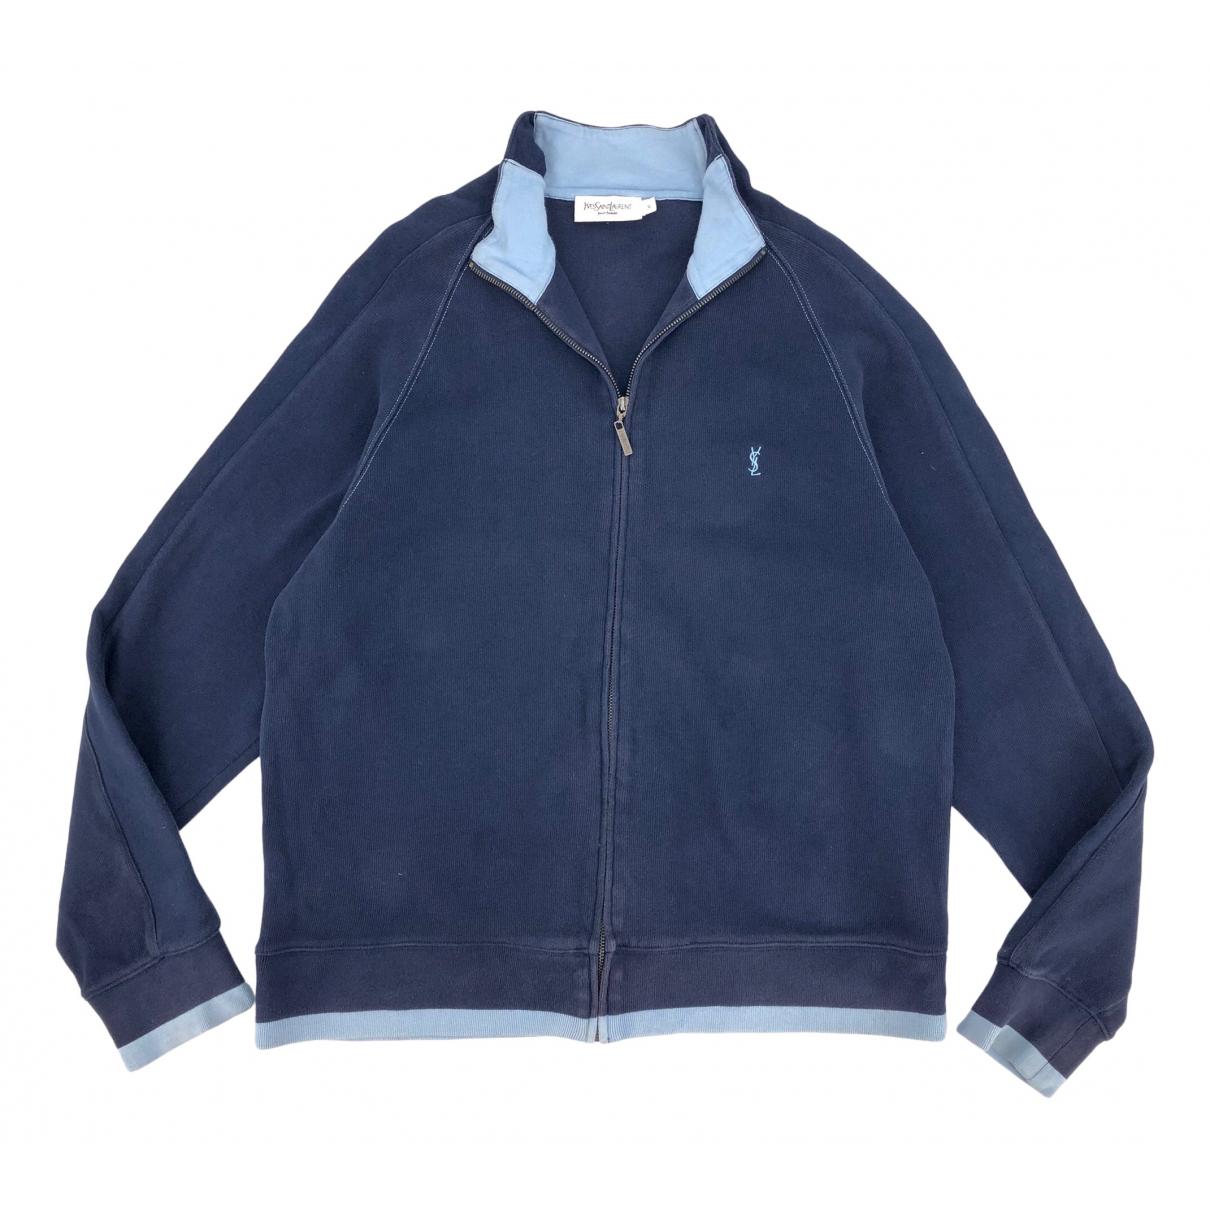 Yves Saint Laurent \N Blue Cotton Knitwear & Sweatshirts for Men XL International